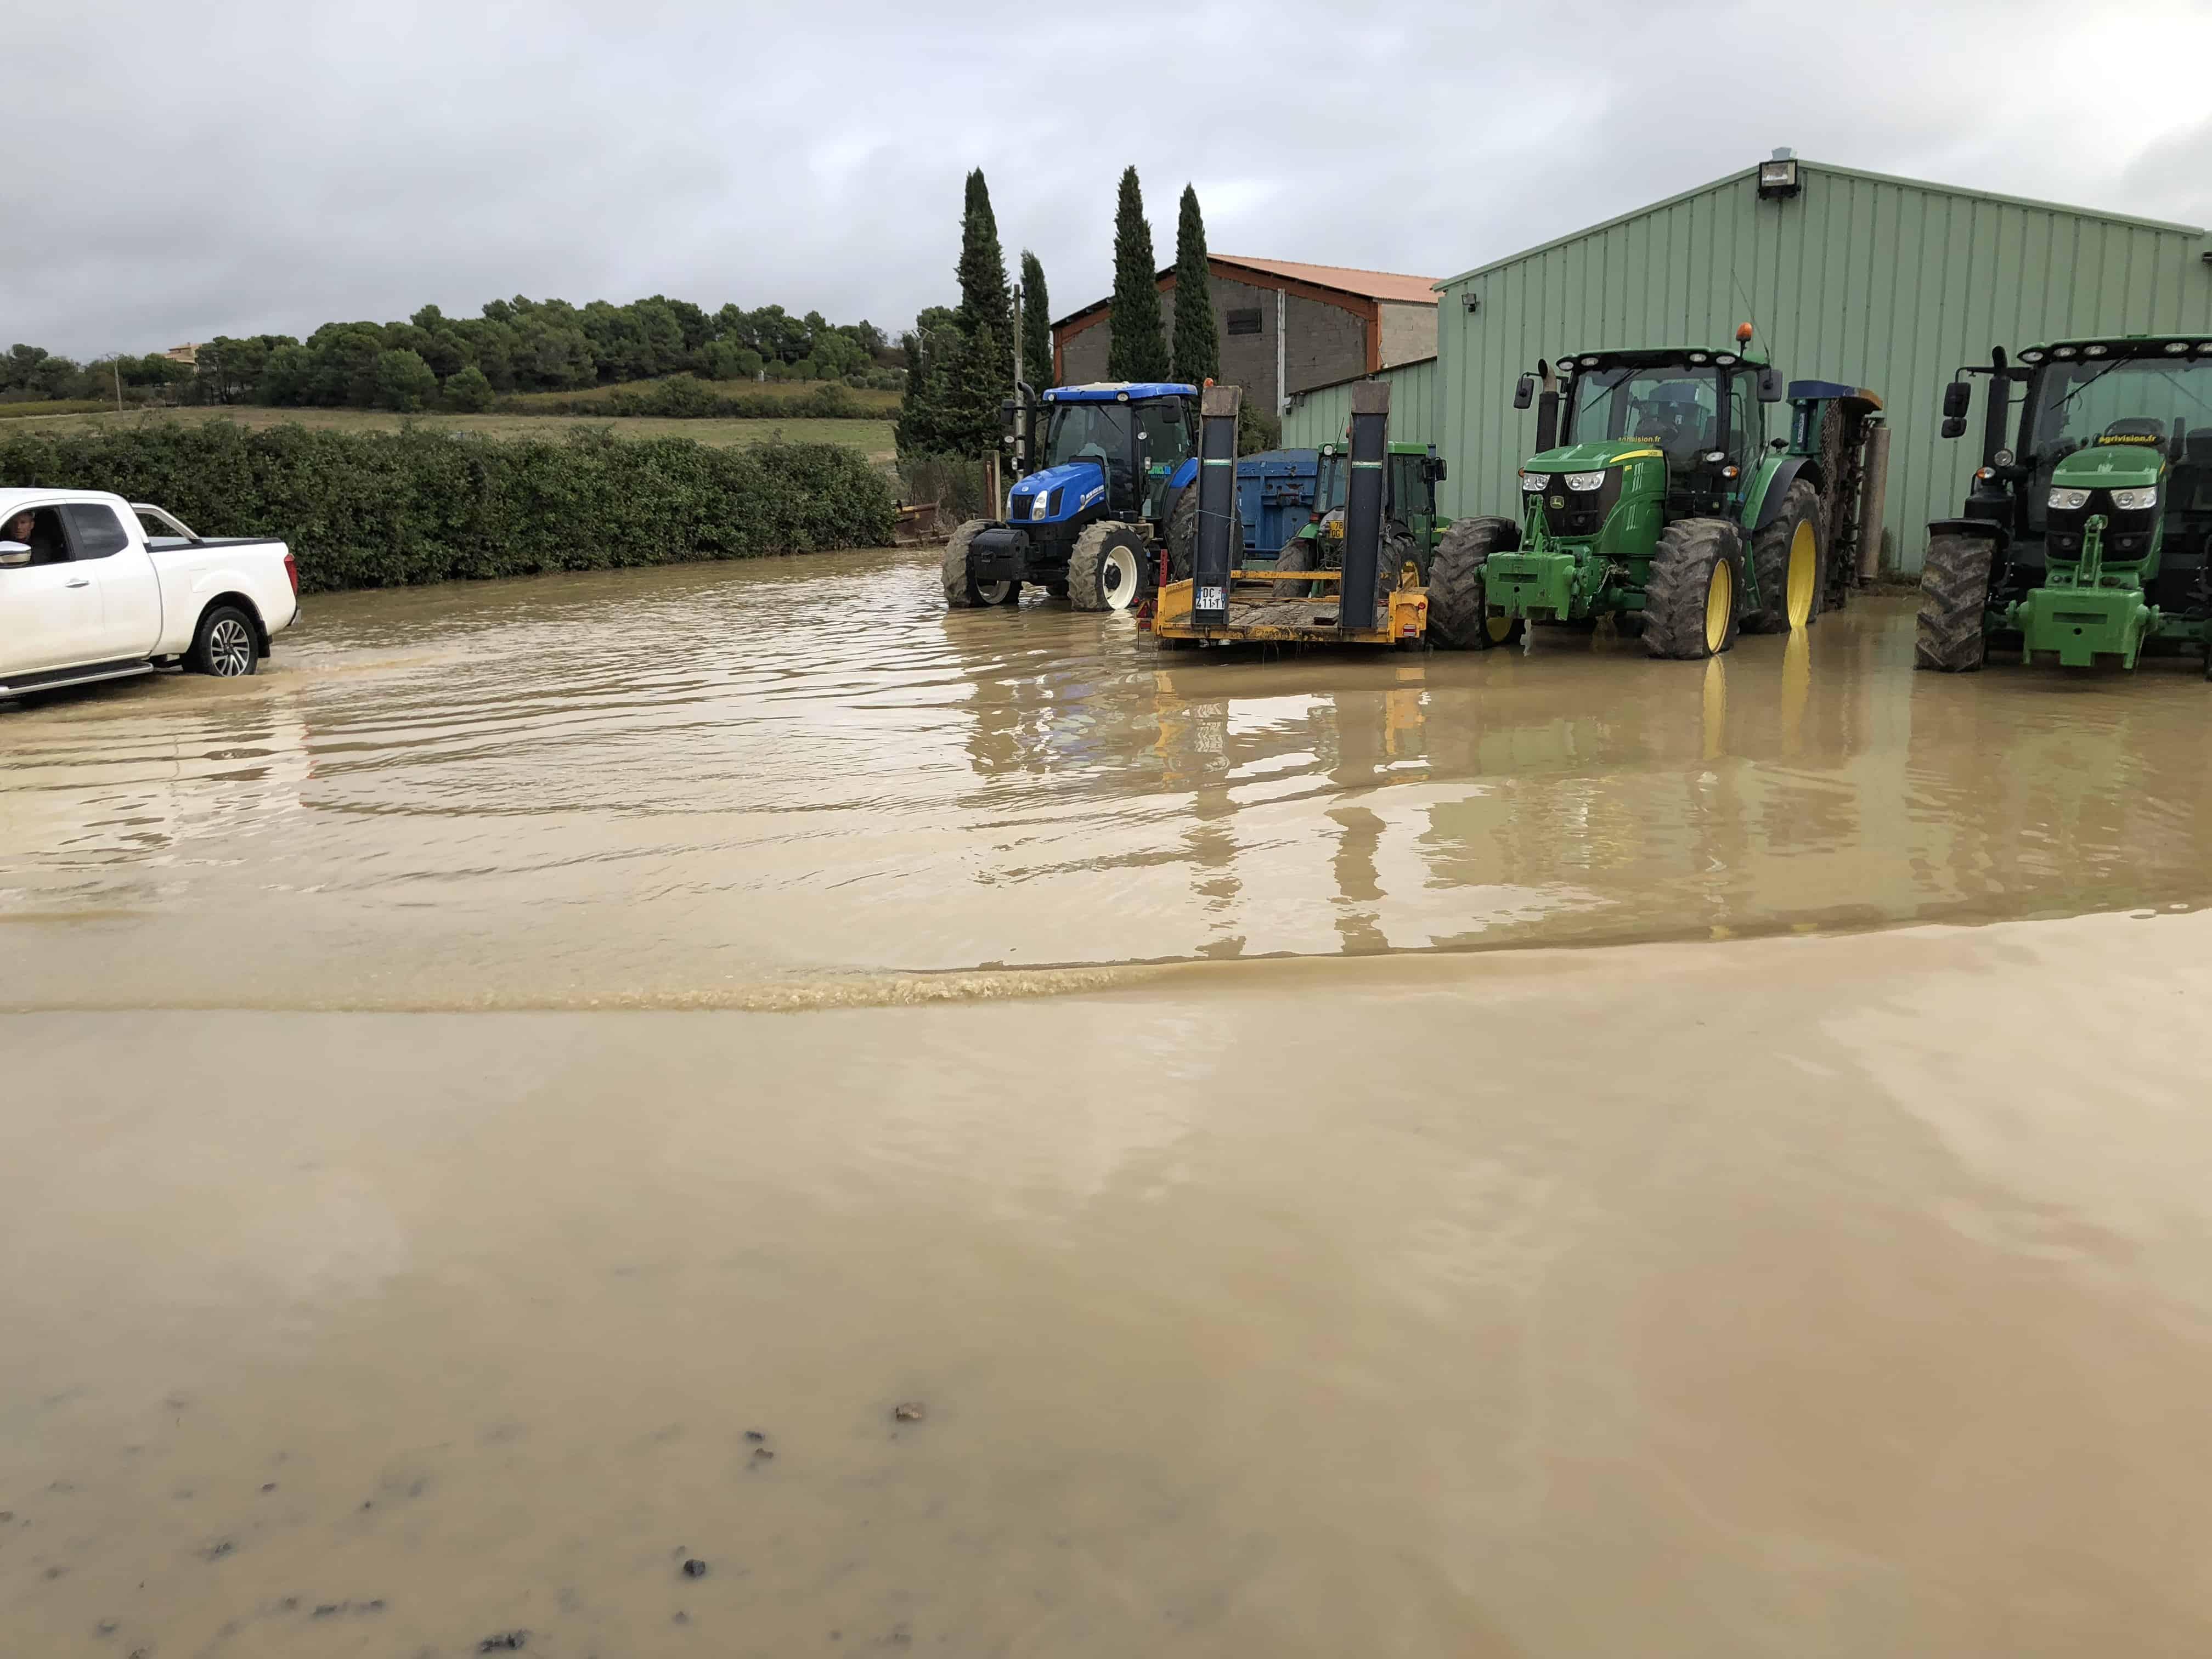 La cuma de Villalier a pu passer ce cap difficile des inondations.